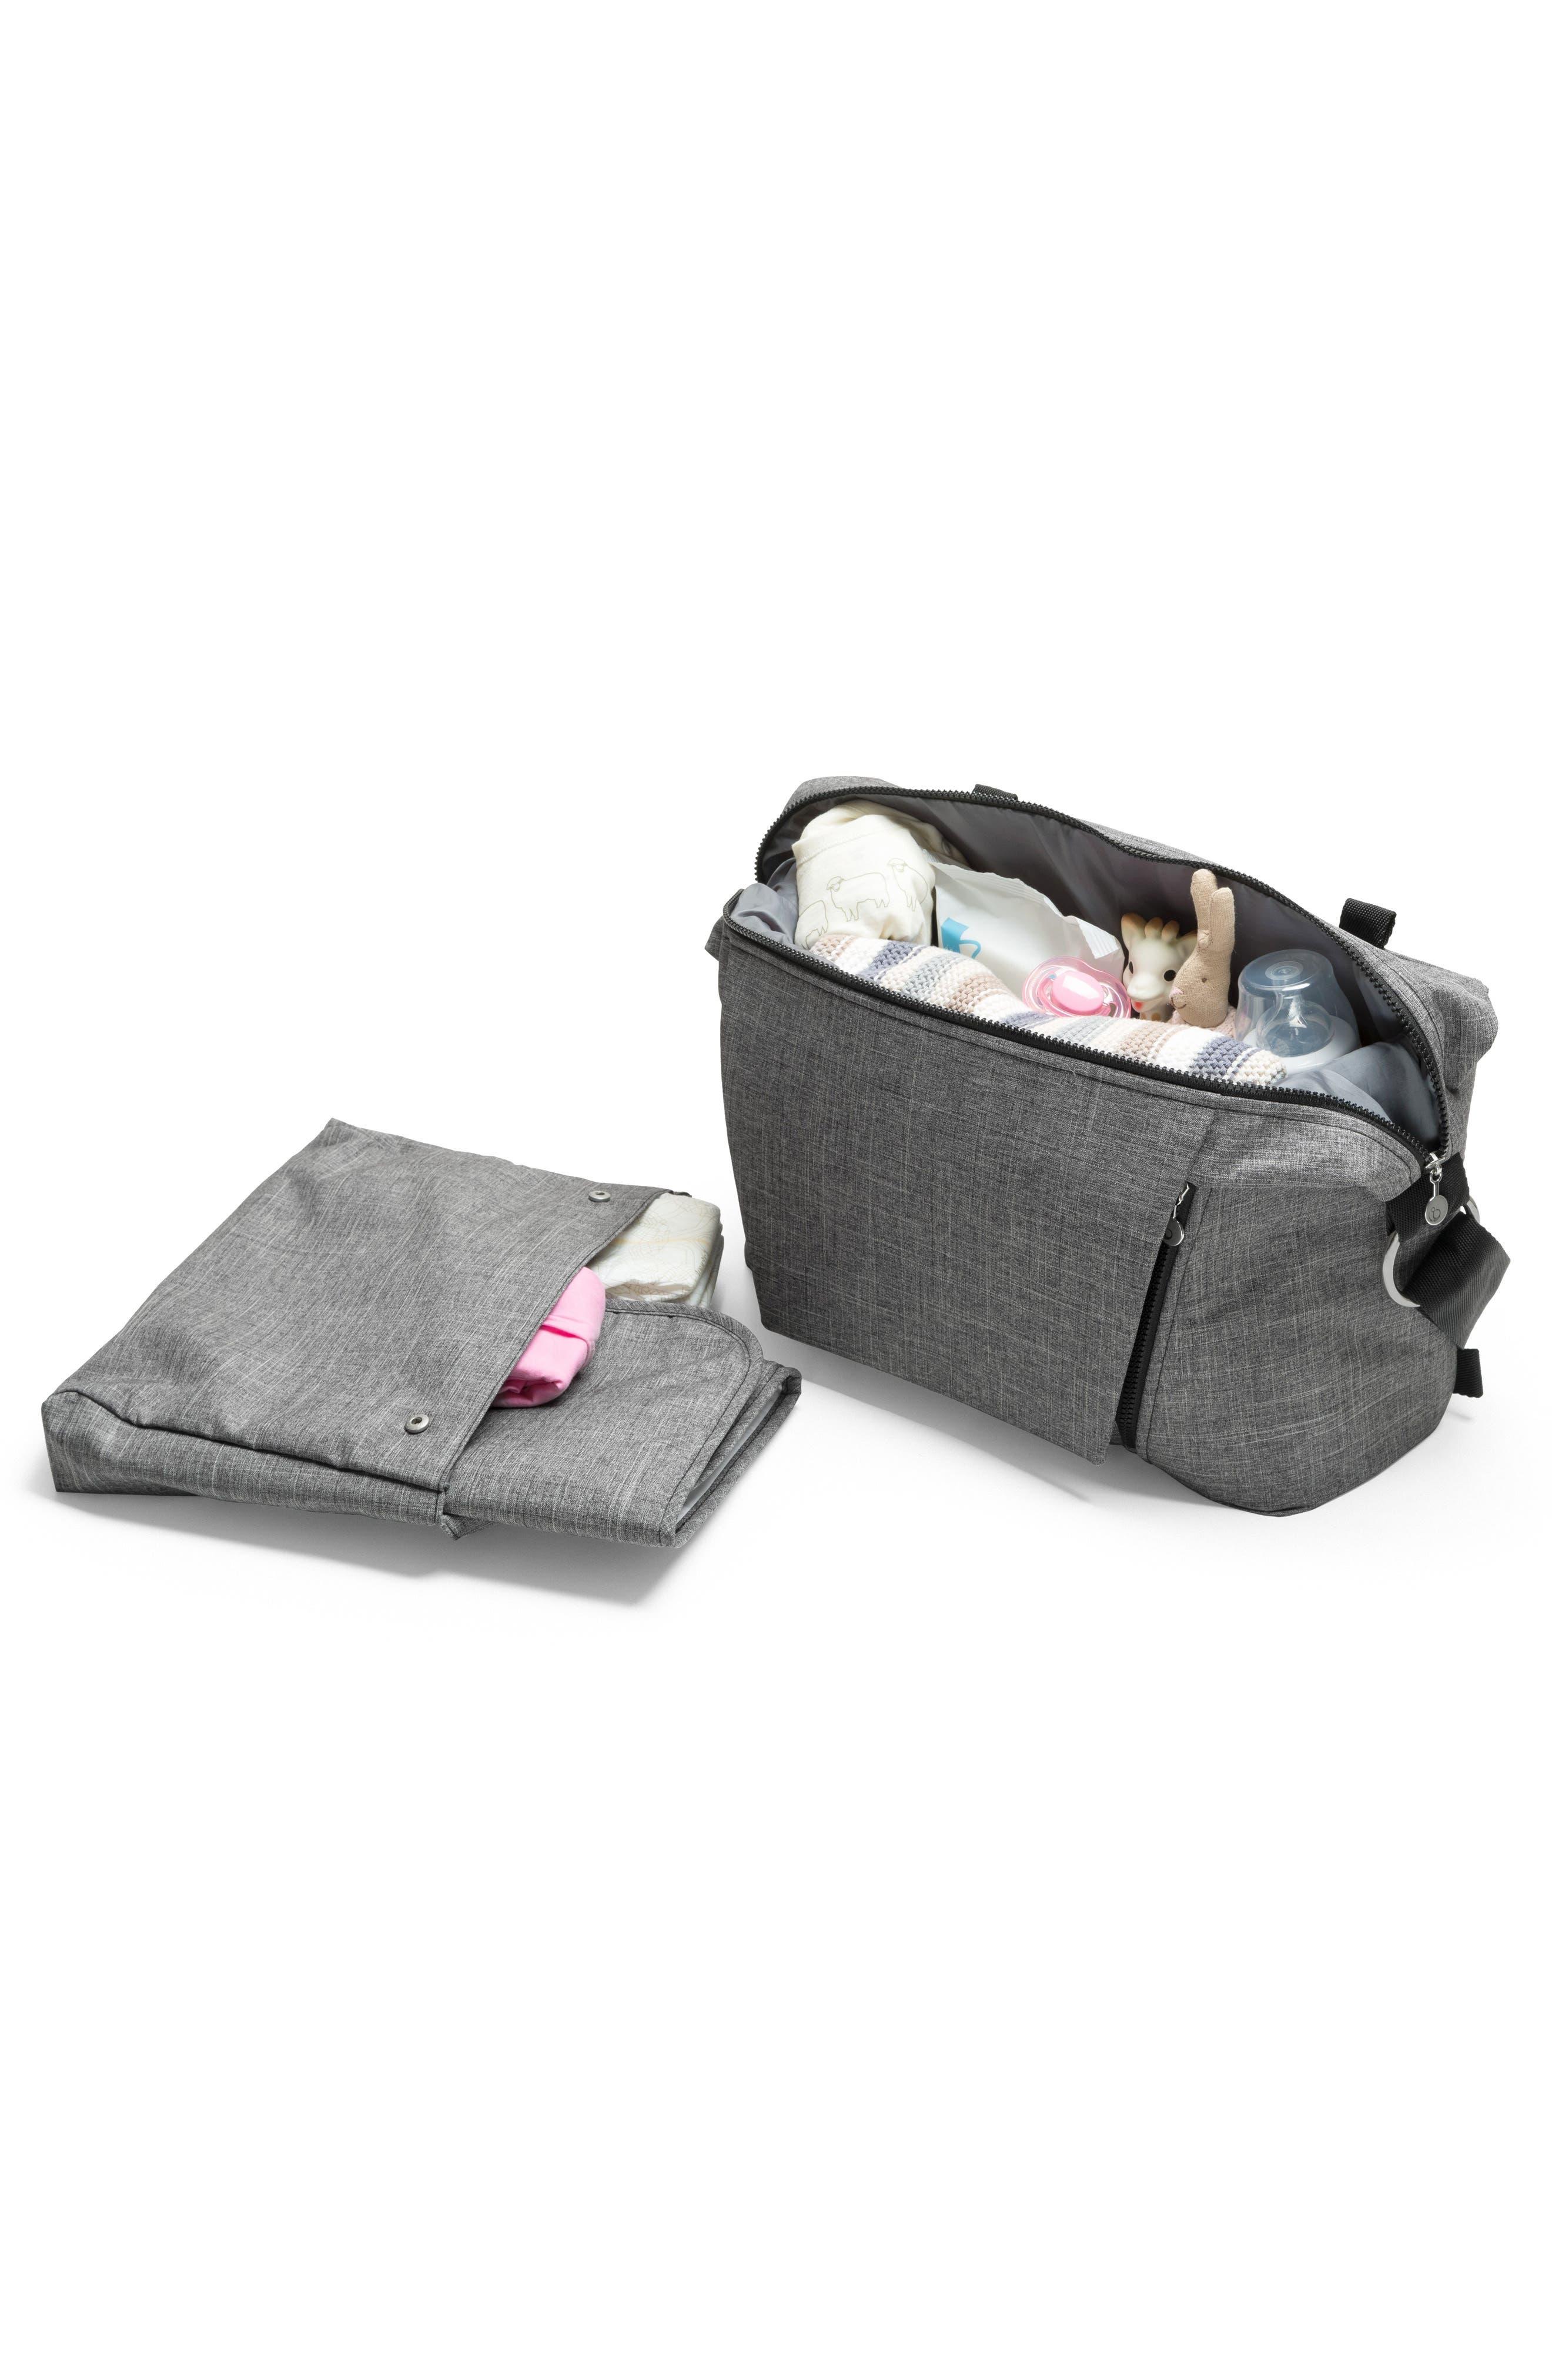 STOKKE, Changing Diaper Bag, Main thumbnail 1, color, BLACK MELANGE